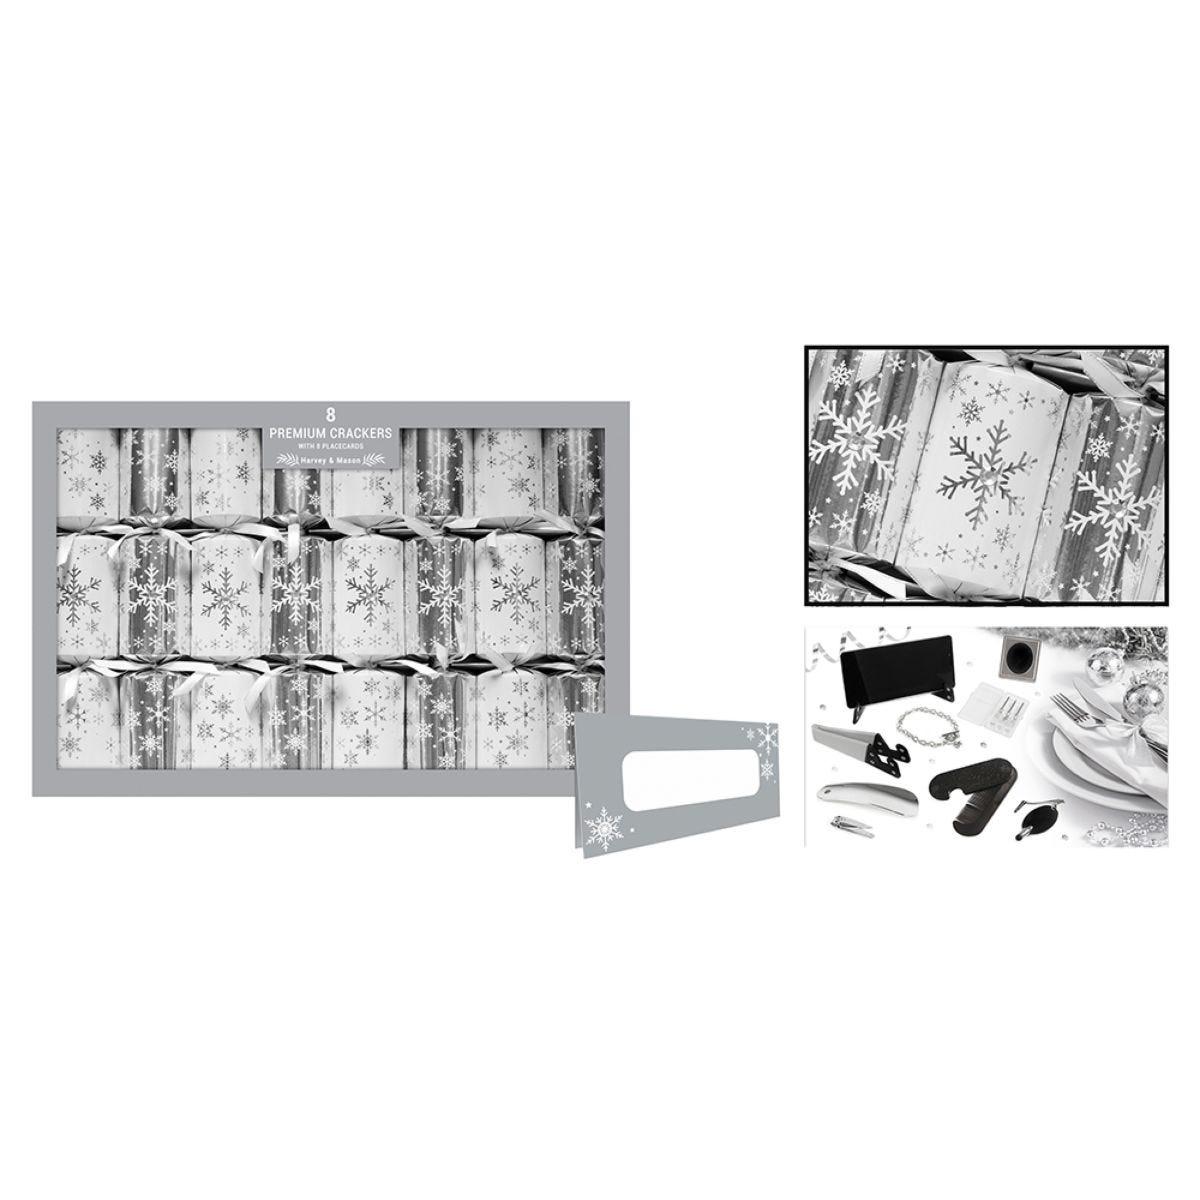 Set of 8 Premium Christmas Crackers - Silver Snowflake